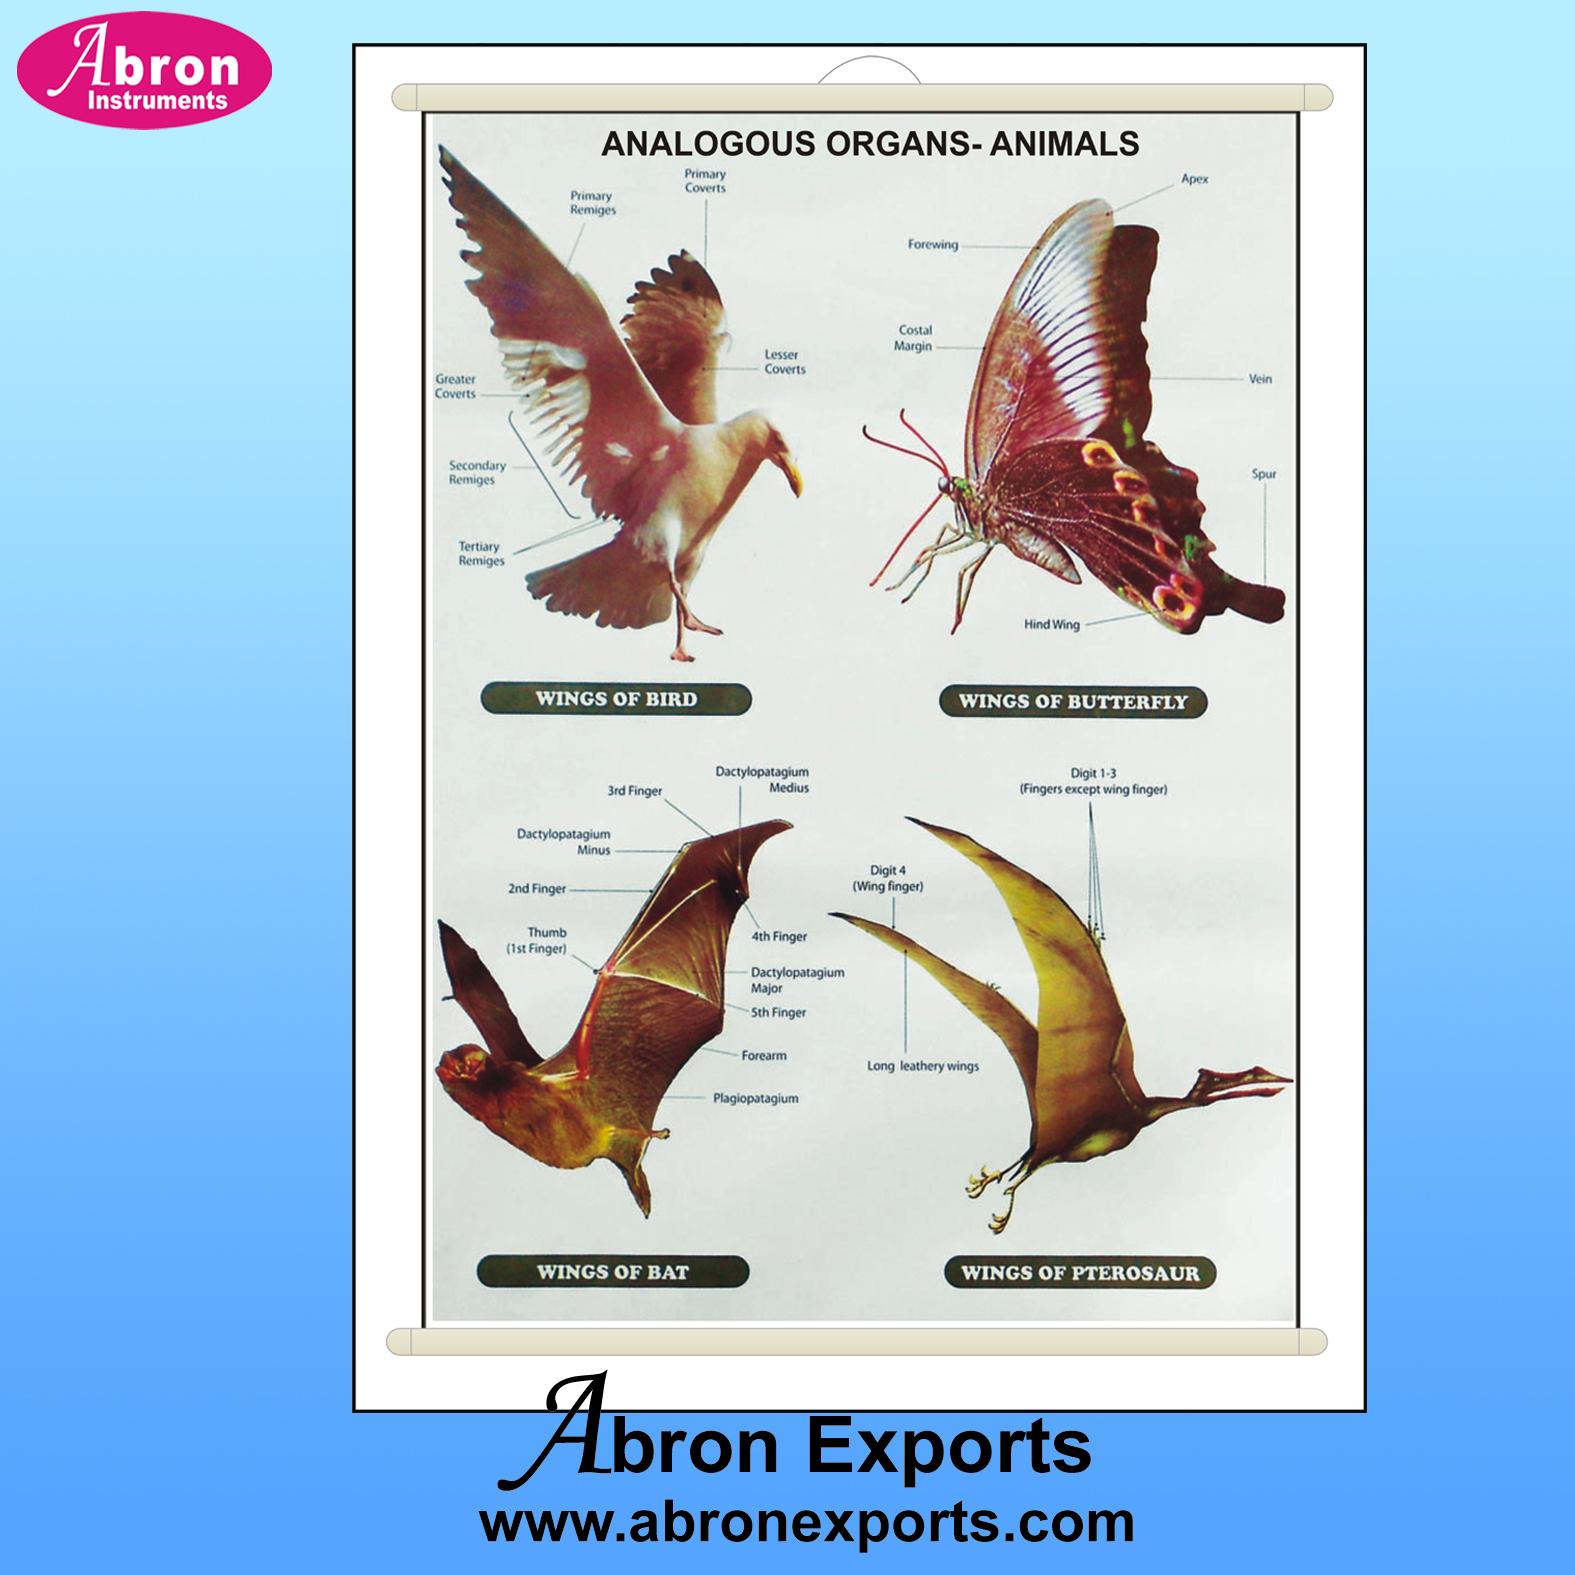 Chart evolution analogous organs animals wings bat birds butterfly similar abron AB-202EAP